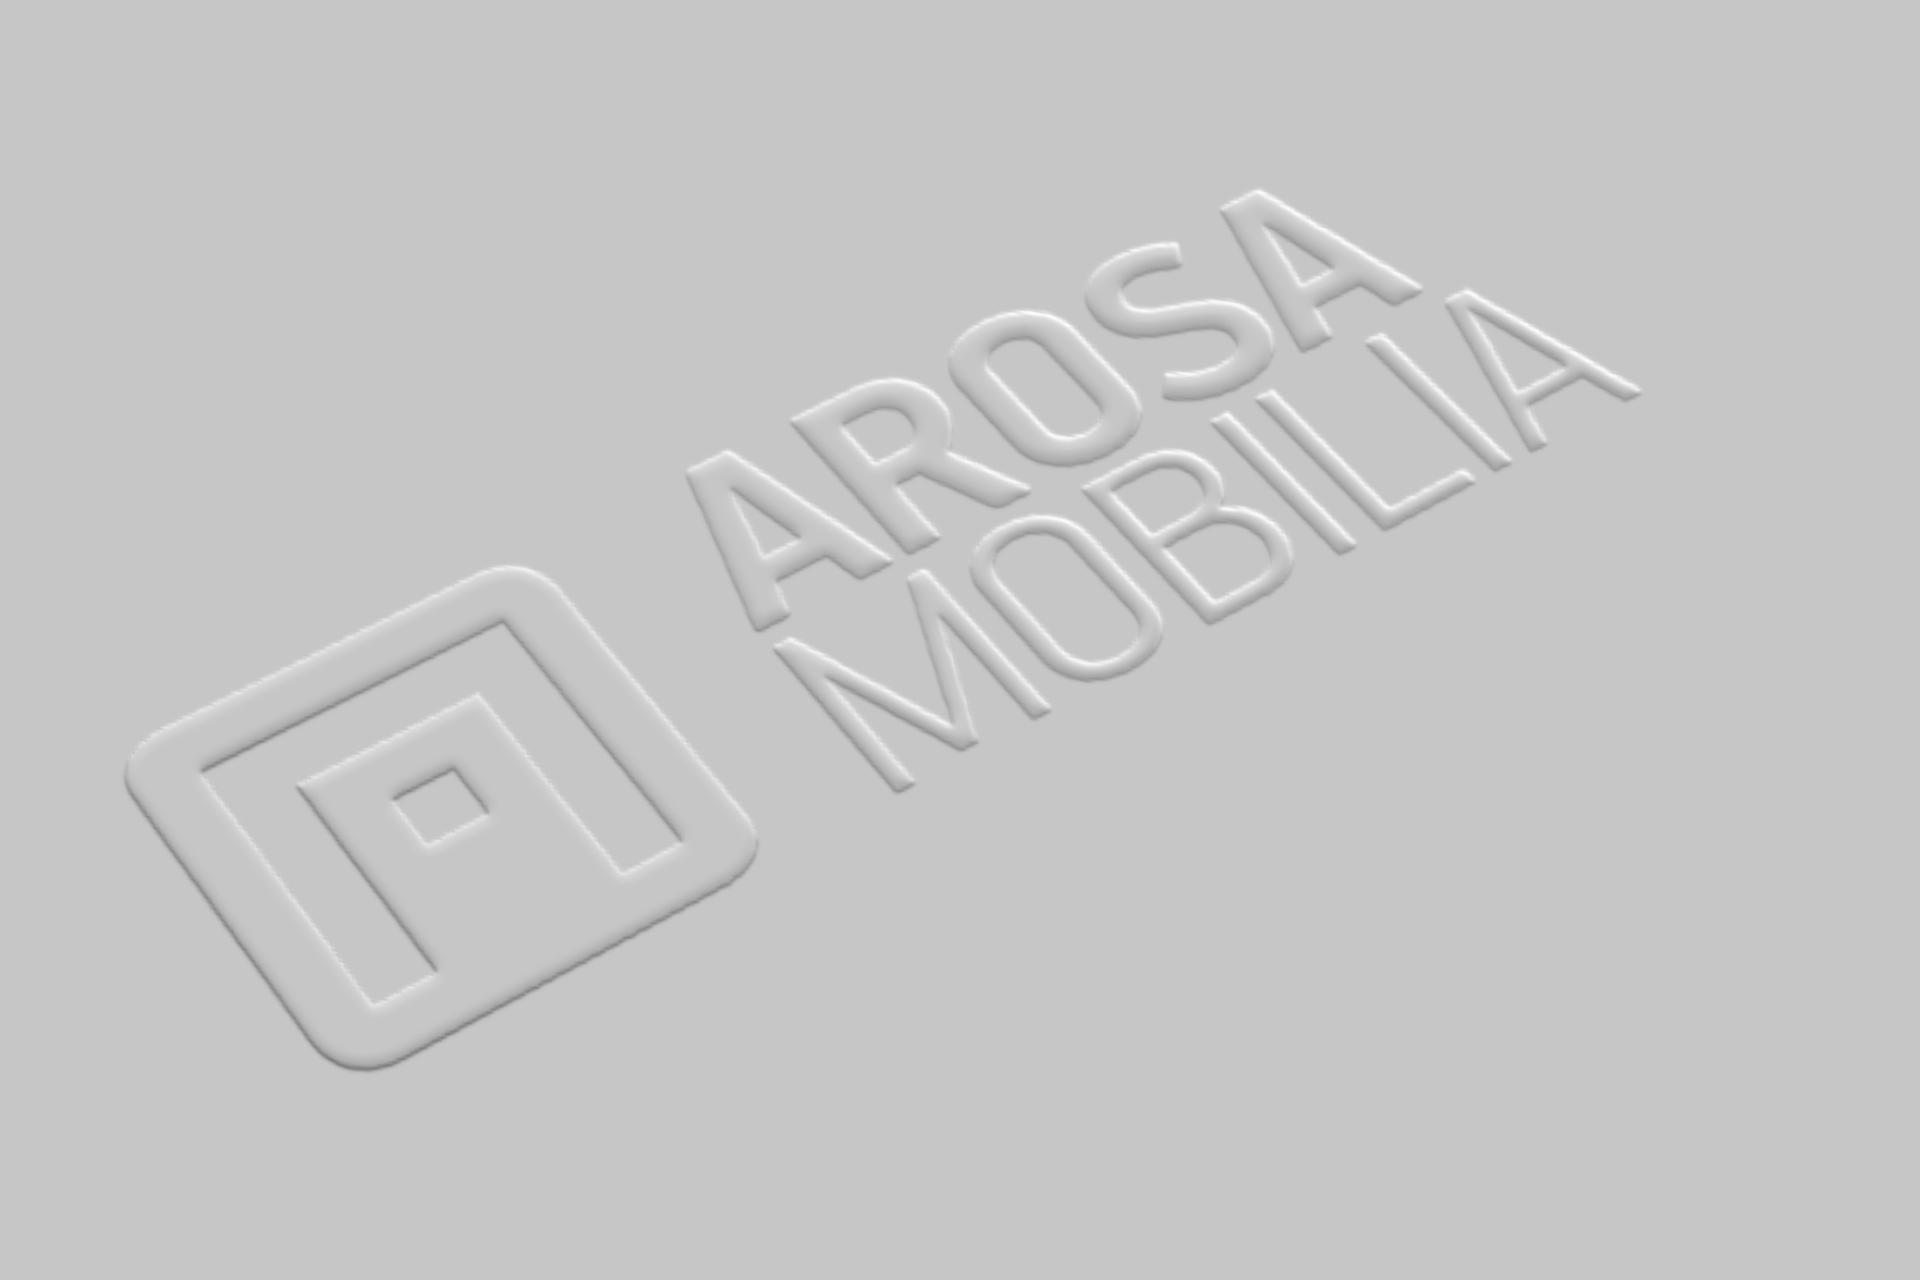 arosa_logo_embossed